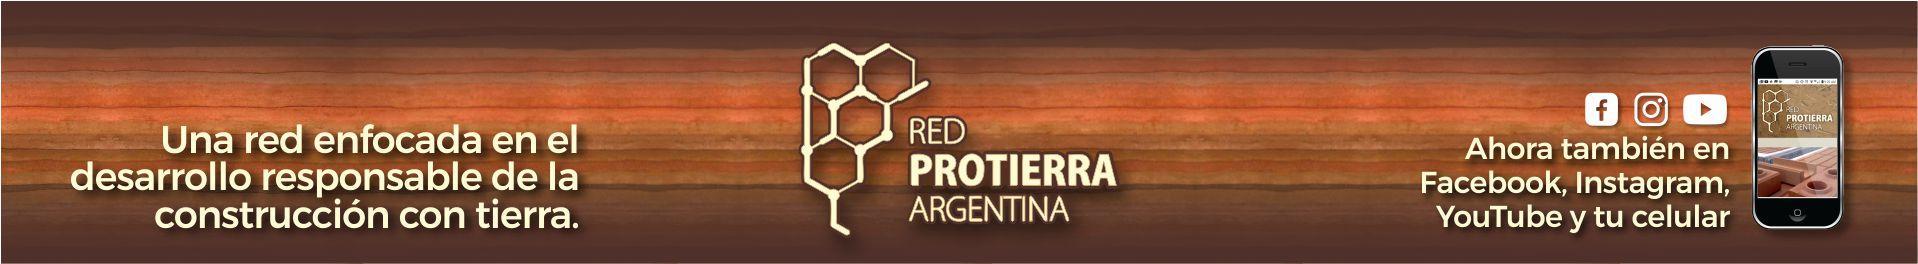 Red Protierra Argentina